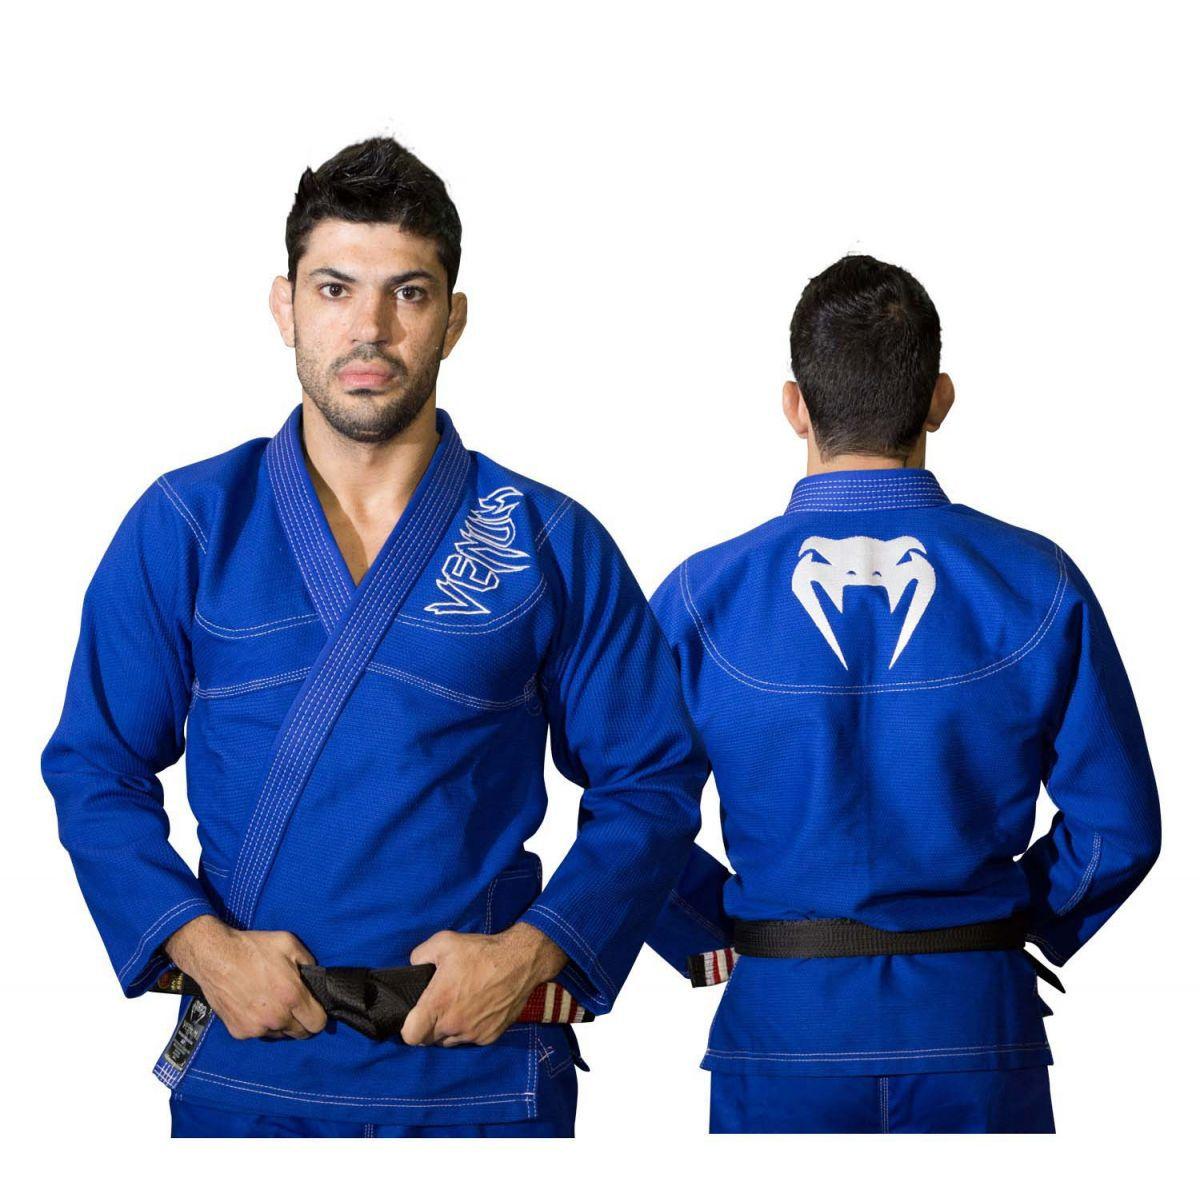 Kimono Jiu Jitsu - Competition Brasil  - Trancado - Venum - Azul .